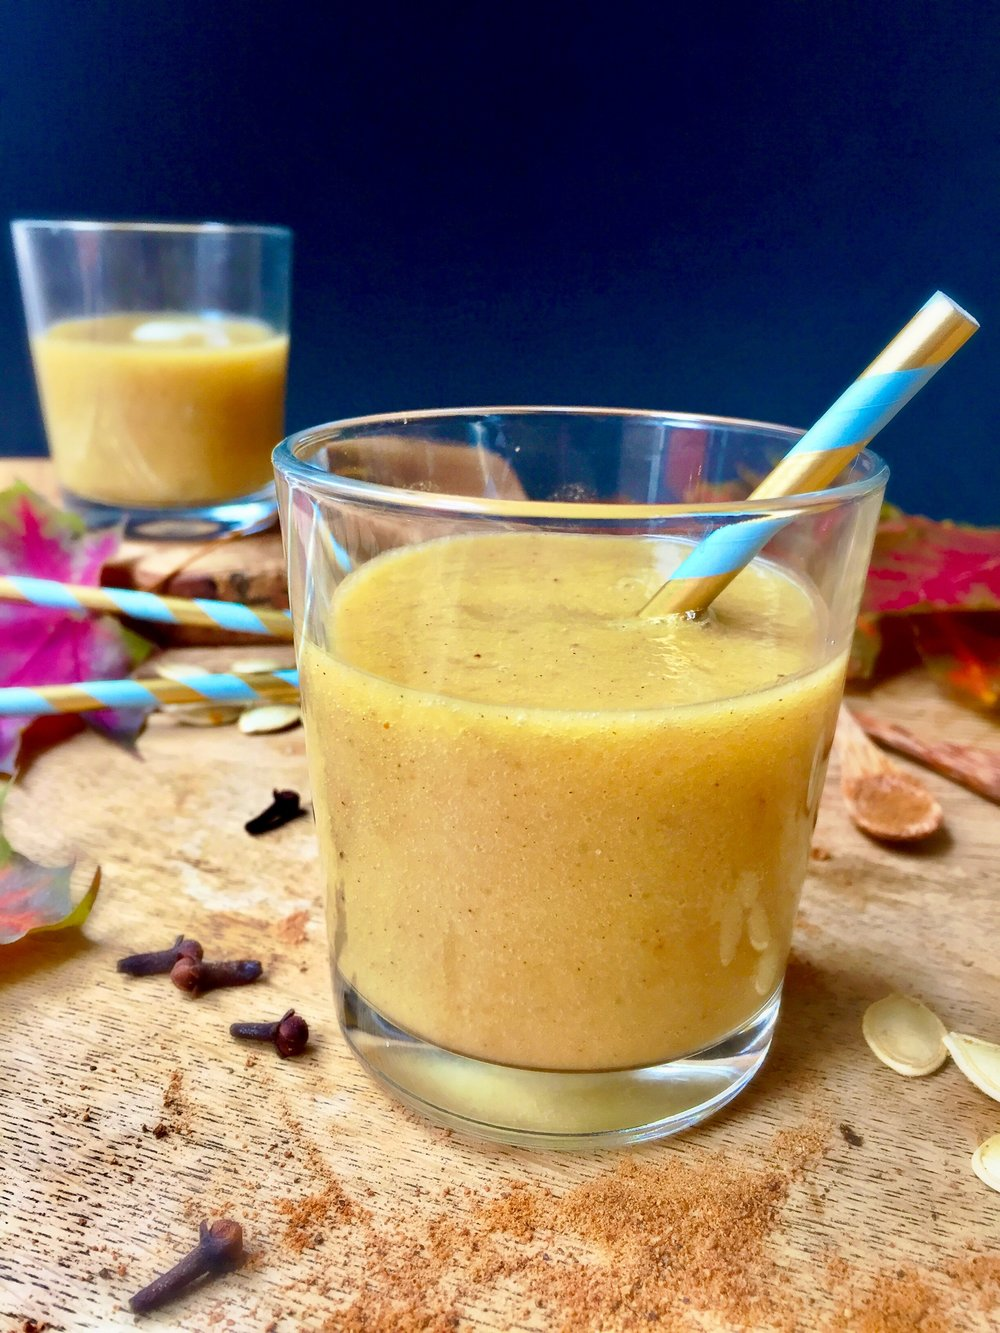 The Flourishing Pantry - Pumpkin Smoothie - Yeast Free Diet